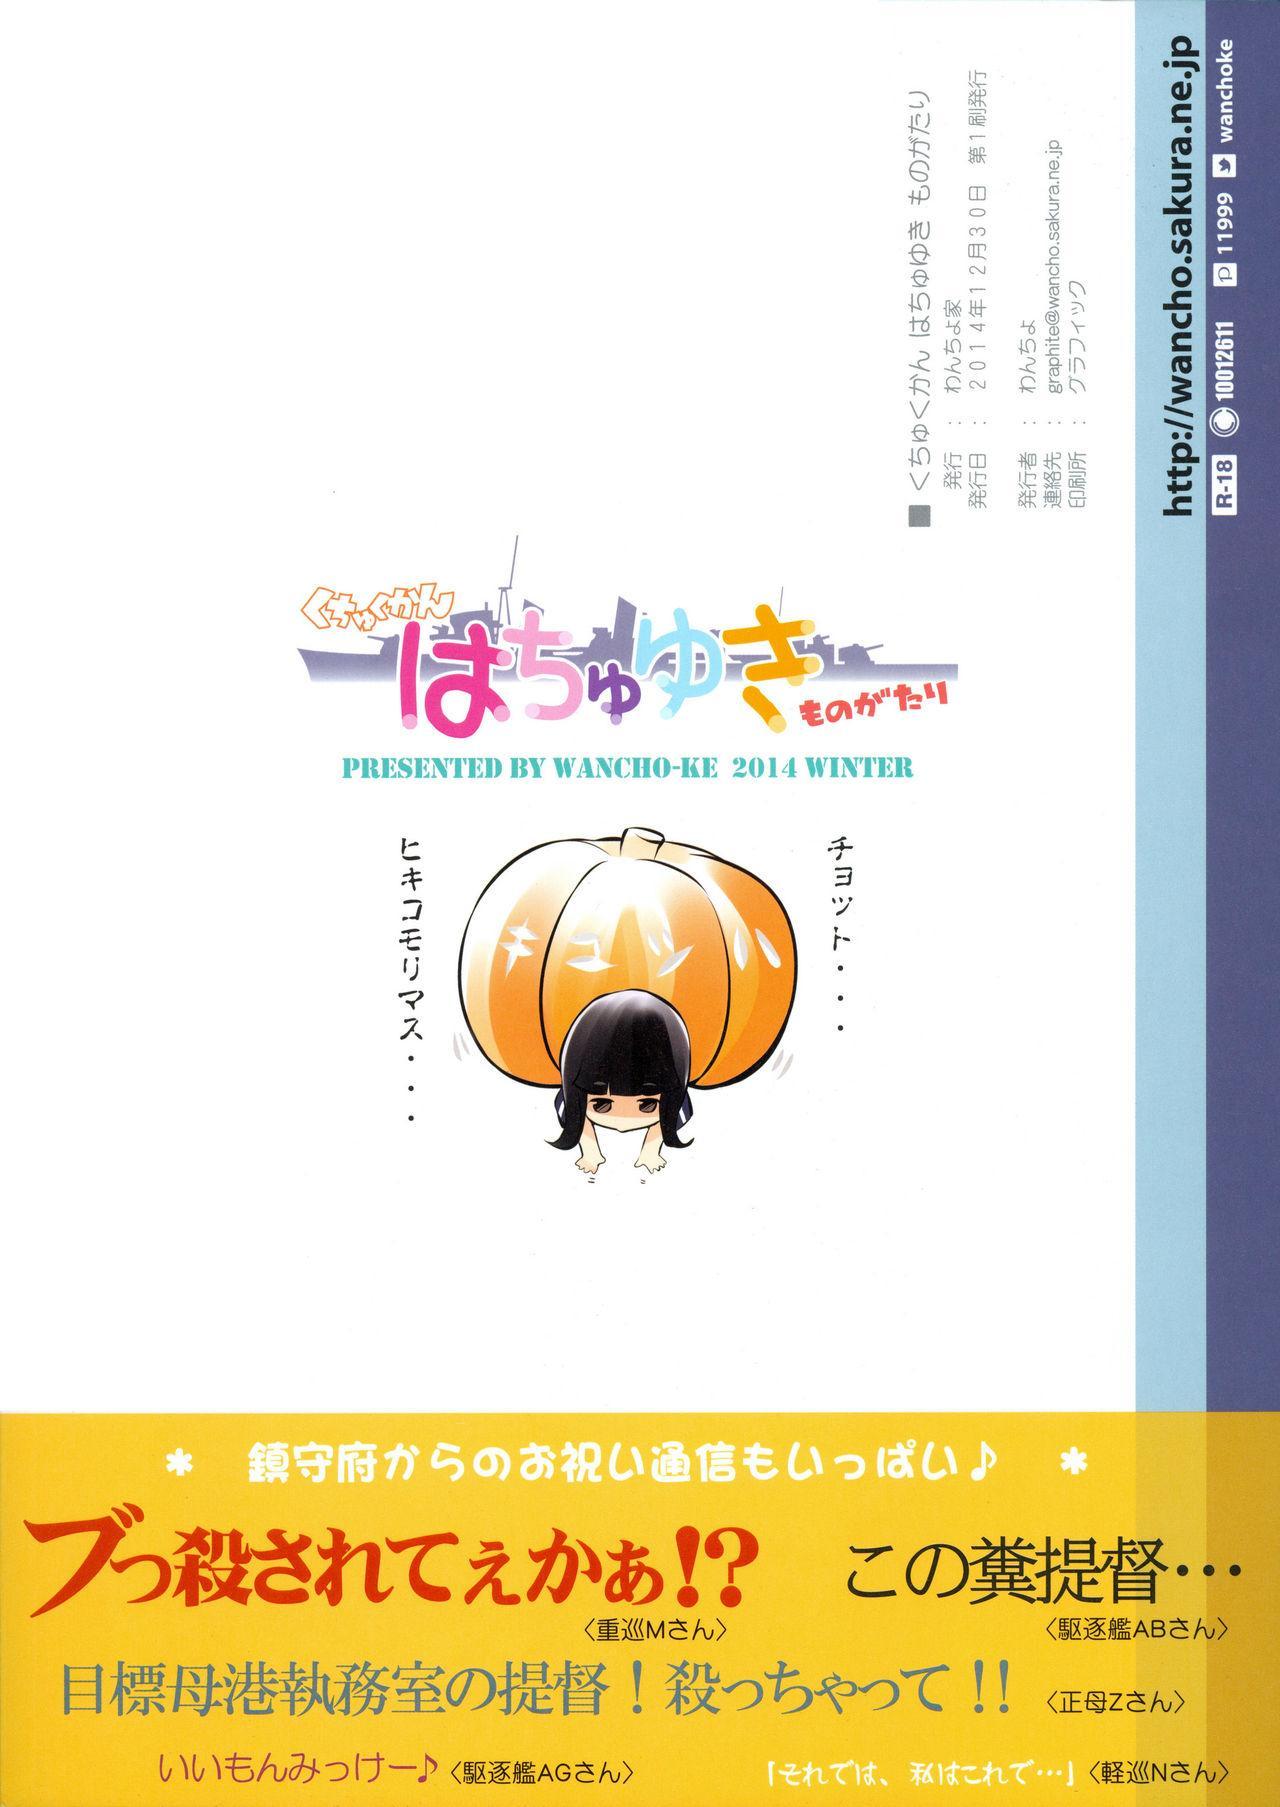 Kuchukukan Hachuyuki Monogatari 35